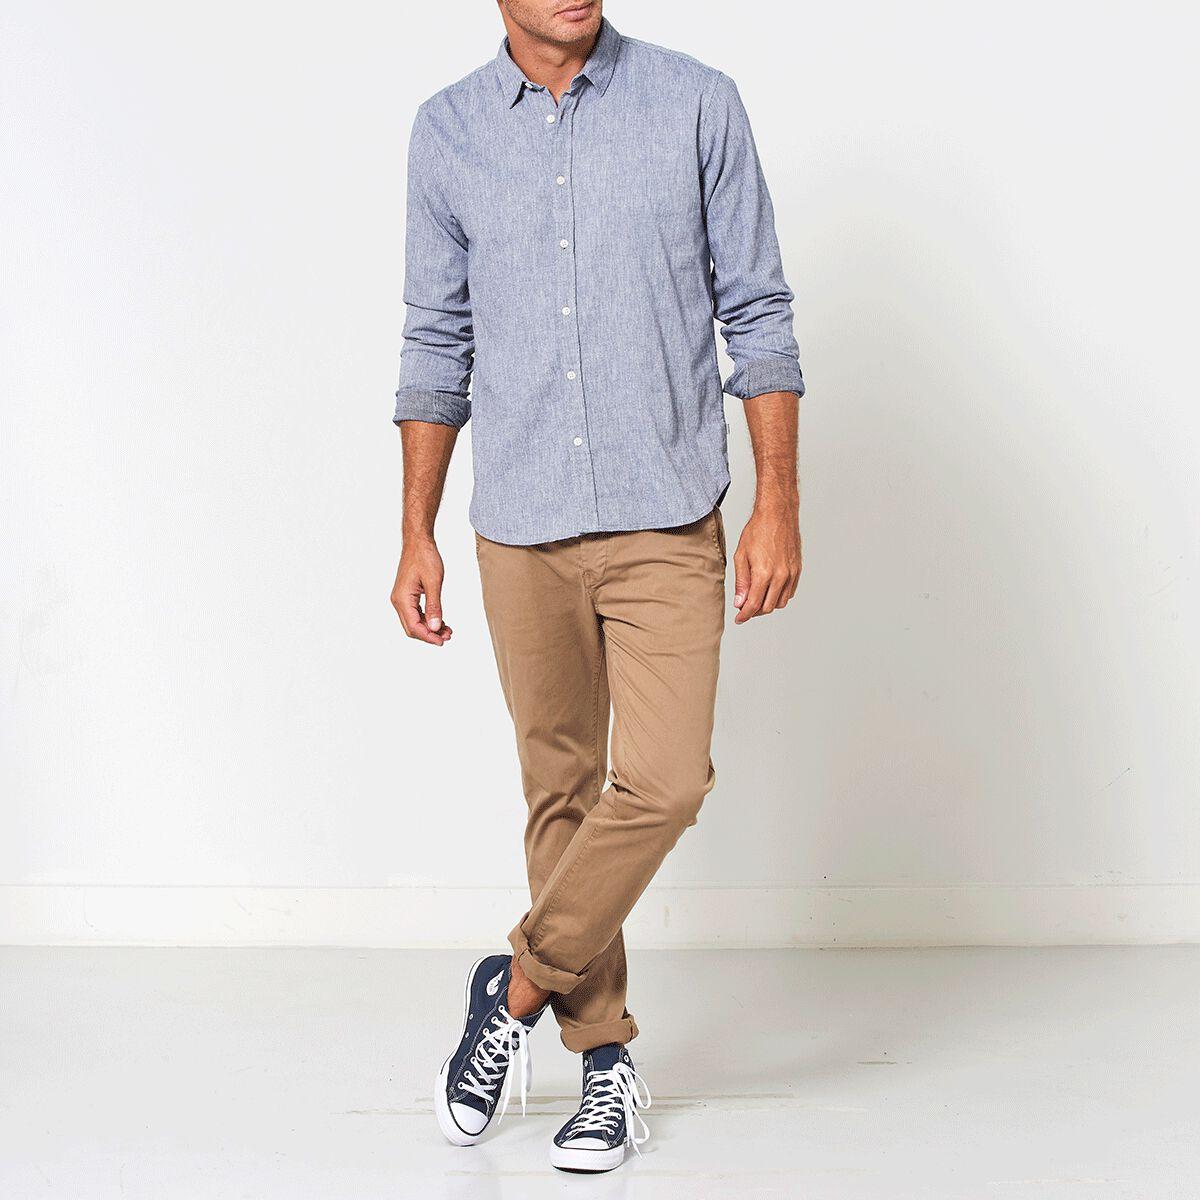 Overhemd Kopen Heren.Heren Overhemd Hopper Blauw Kopen Online